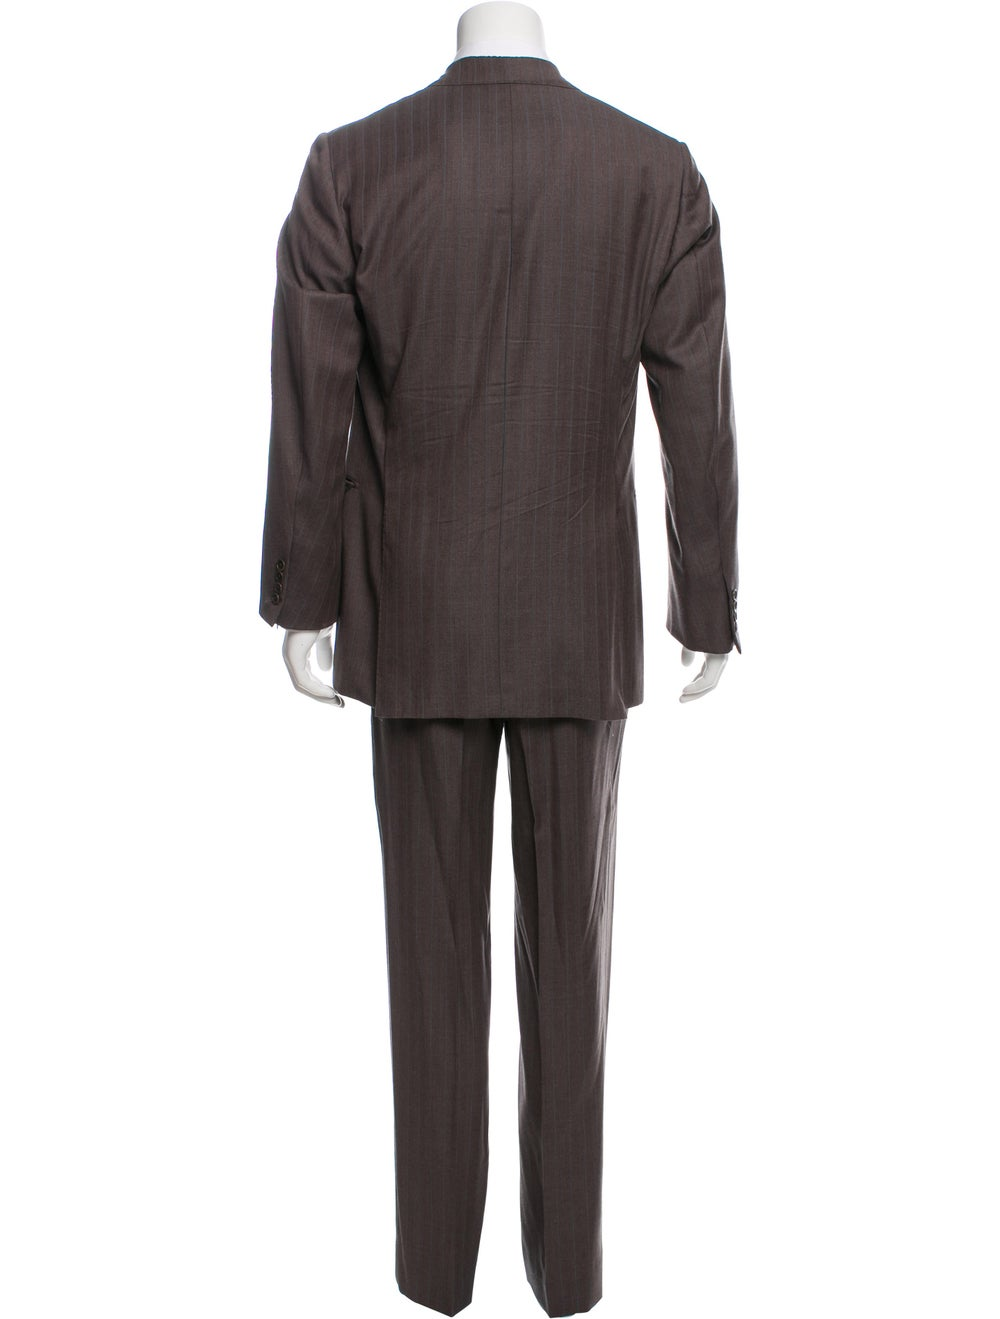 Battistoni Silk-Blend Pinstriped Two-Piece Suit - image 3